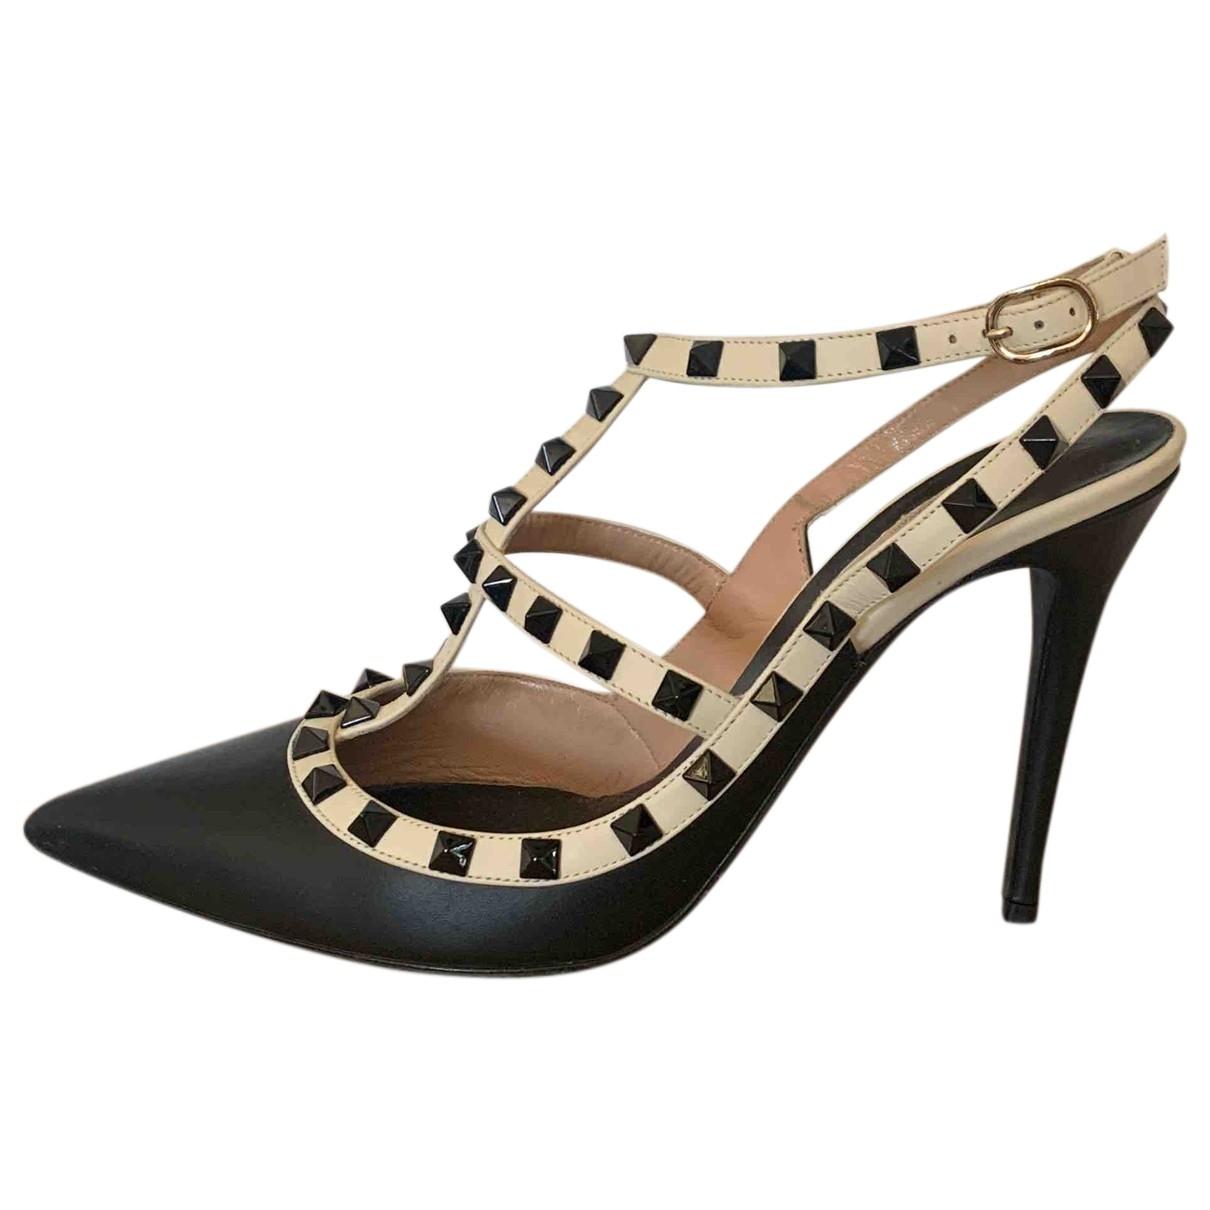 Valentino Garavani Rockstud Black Leather Heels for Women 40.5 EU